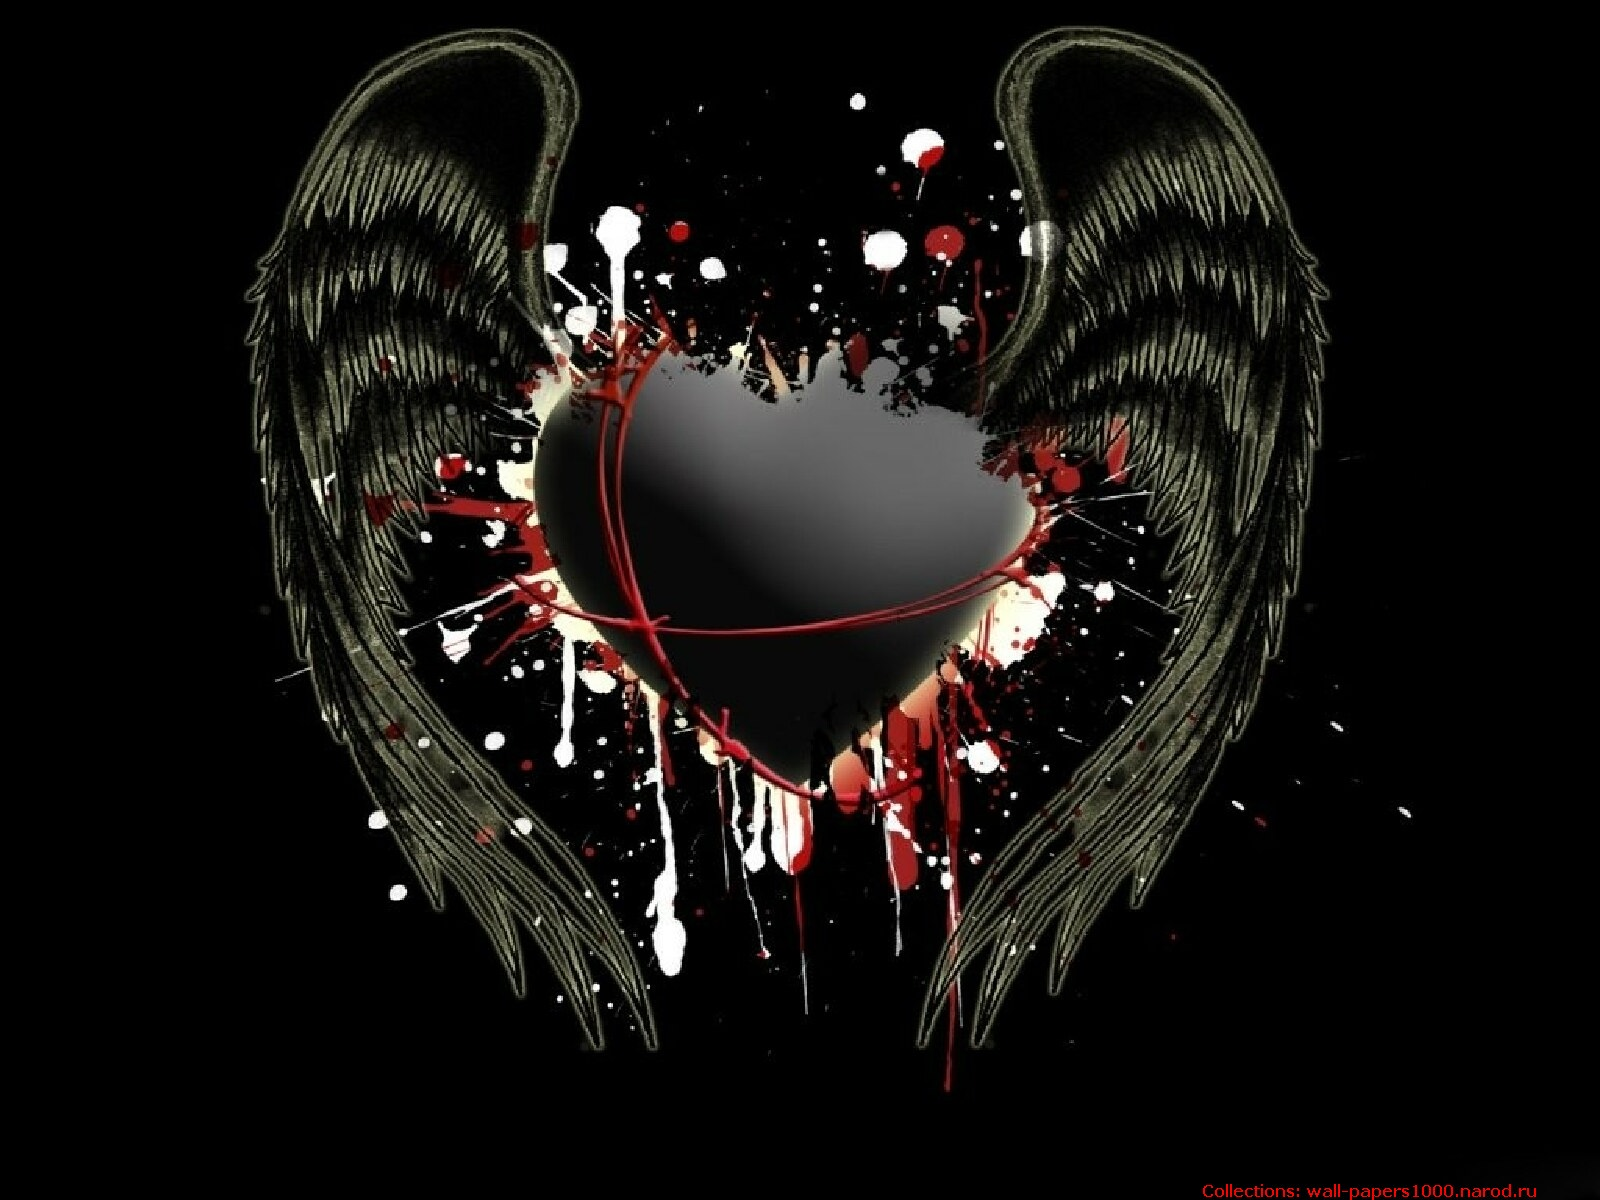 Эквалайзер крылья любви 2 фотография